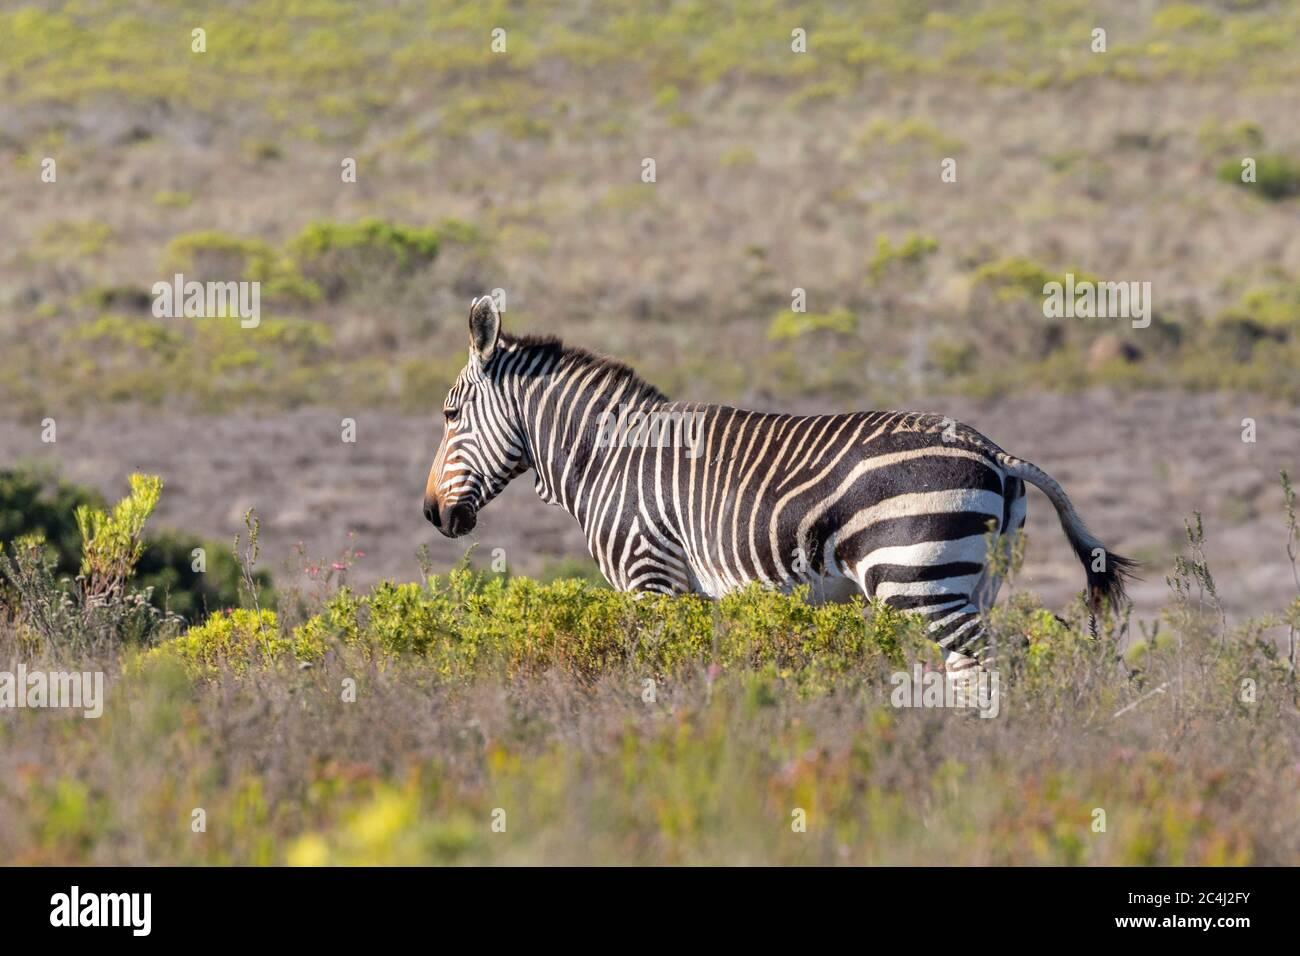 Cape Mountain Zebra (Equus zebra zebra) in fynbos, Bontebok National Park, Swellendam, Western Cape South Africa. IUCN Vulnerable species Stock Photo